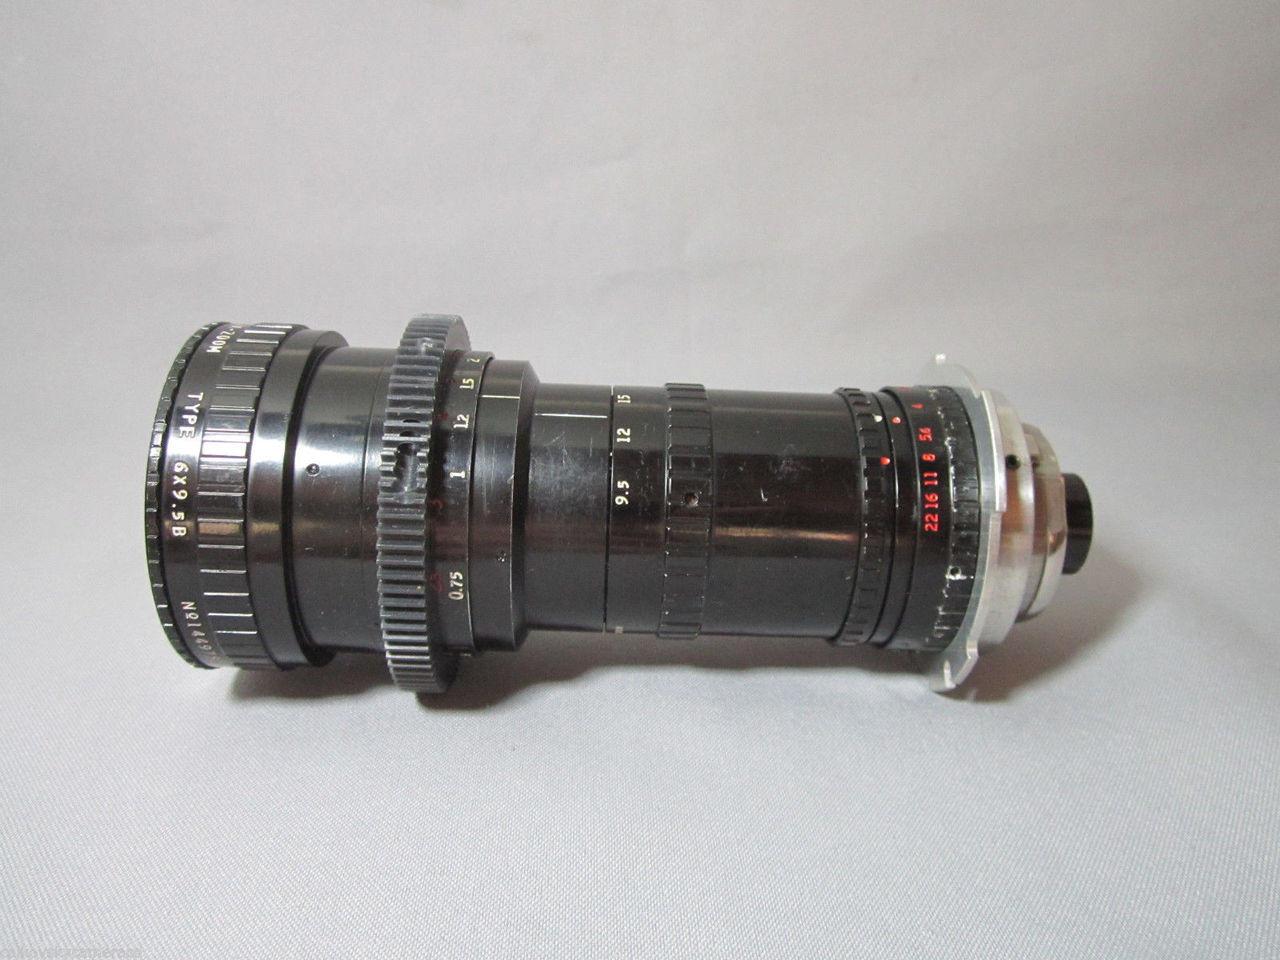 Angenieux 1 6 - 2 2 /9 5 - 57mm Bayo Mount Zoom Lens (No 1449750